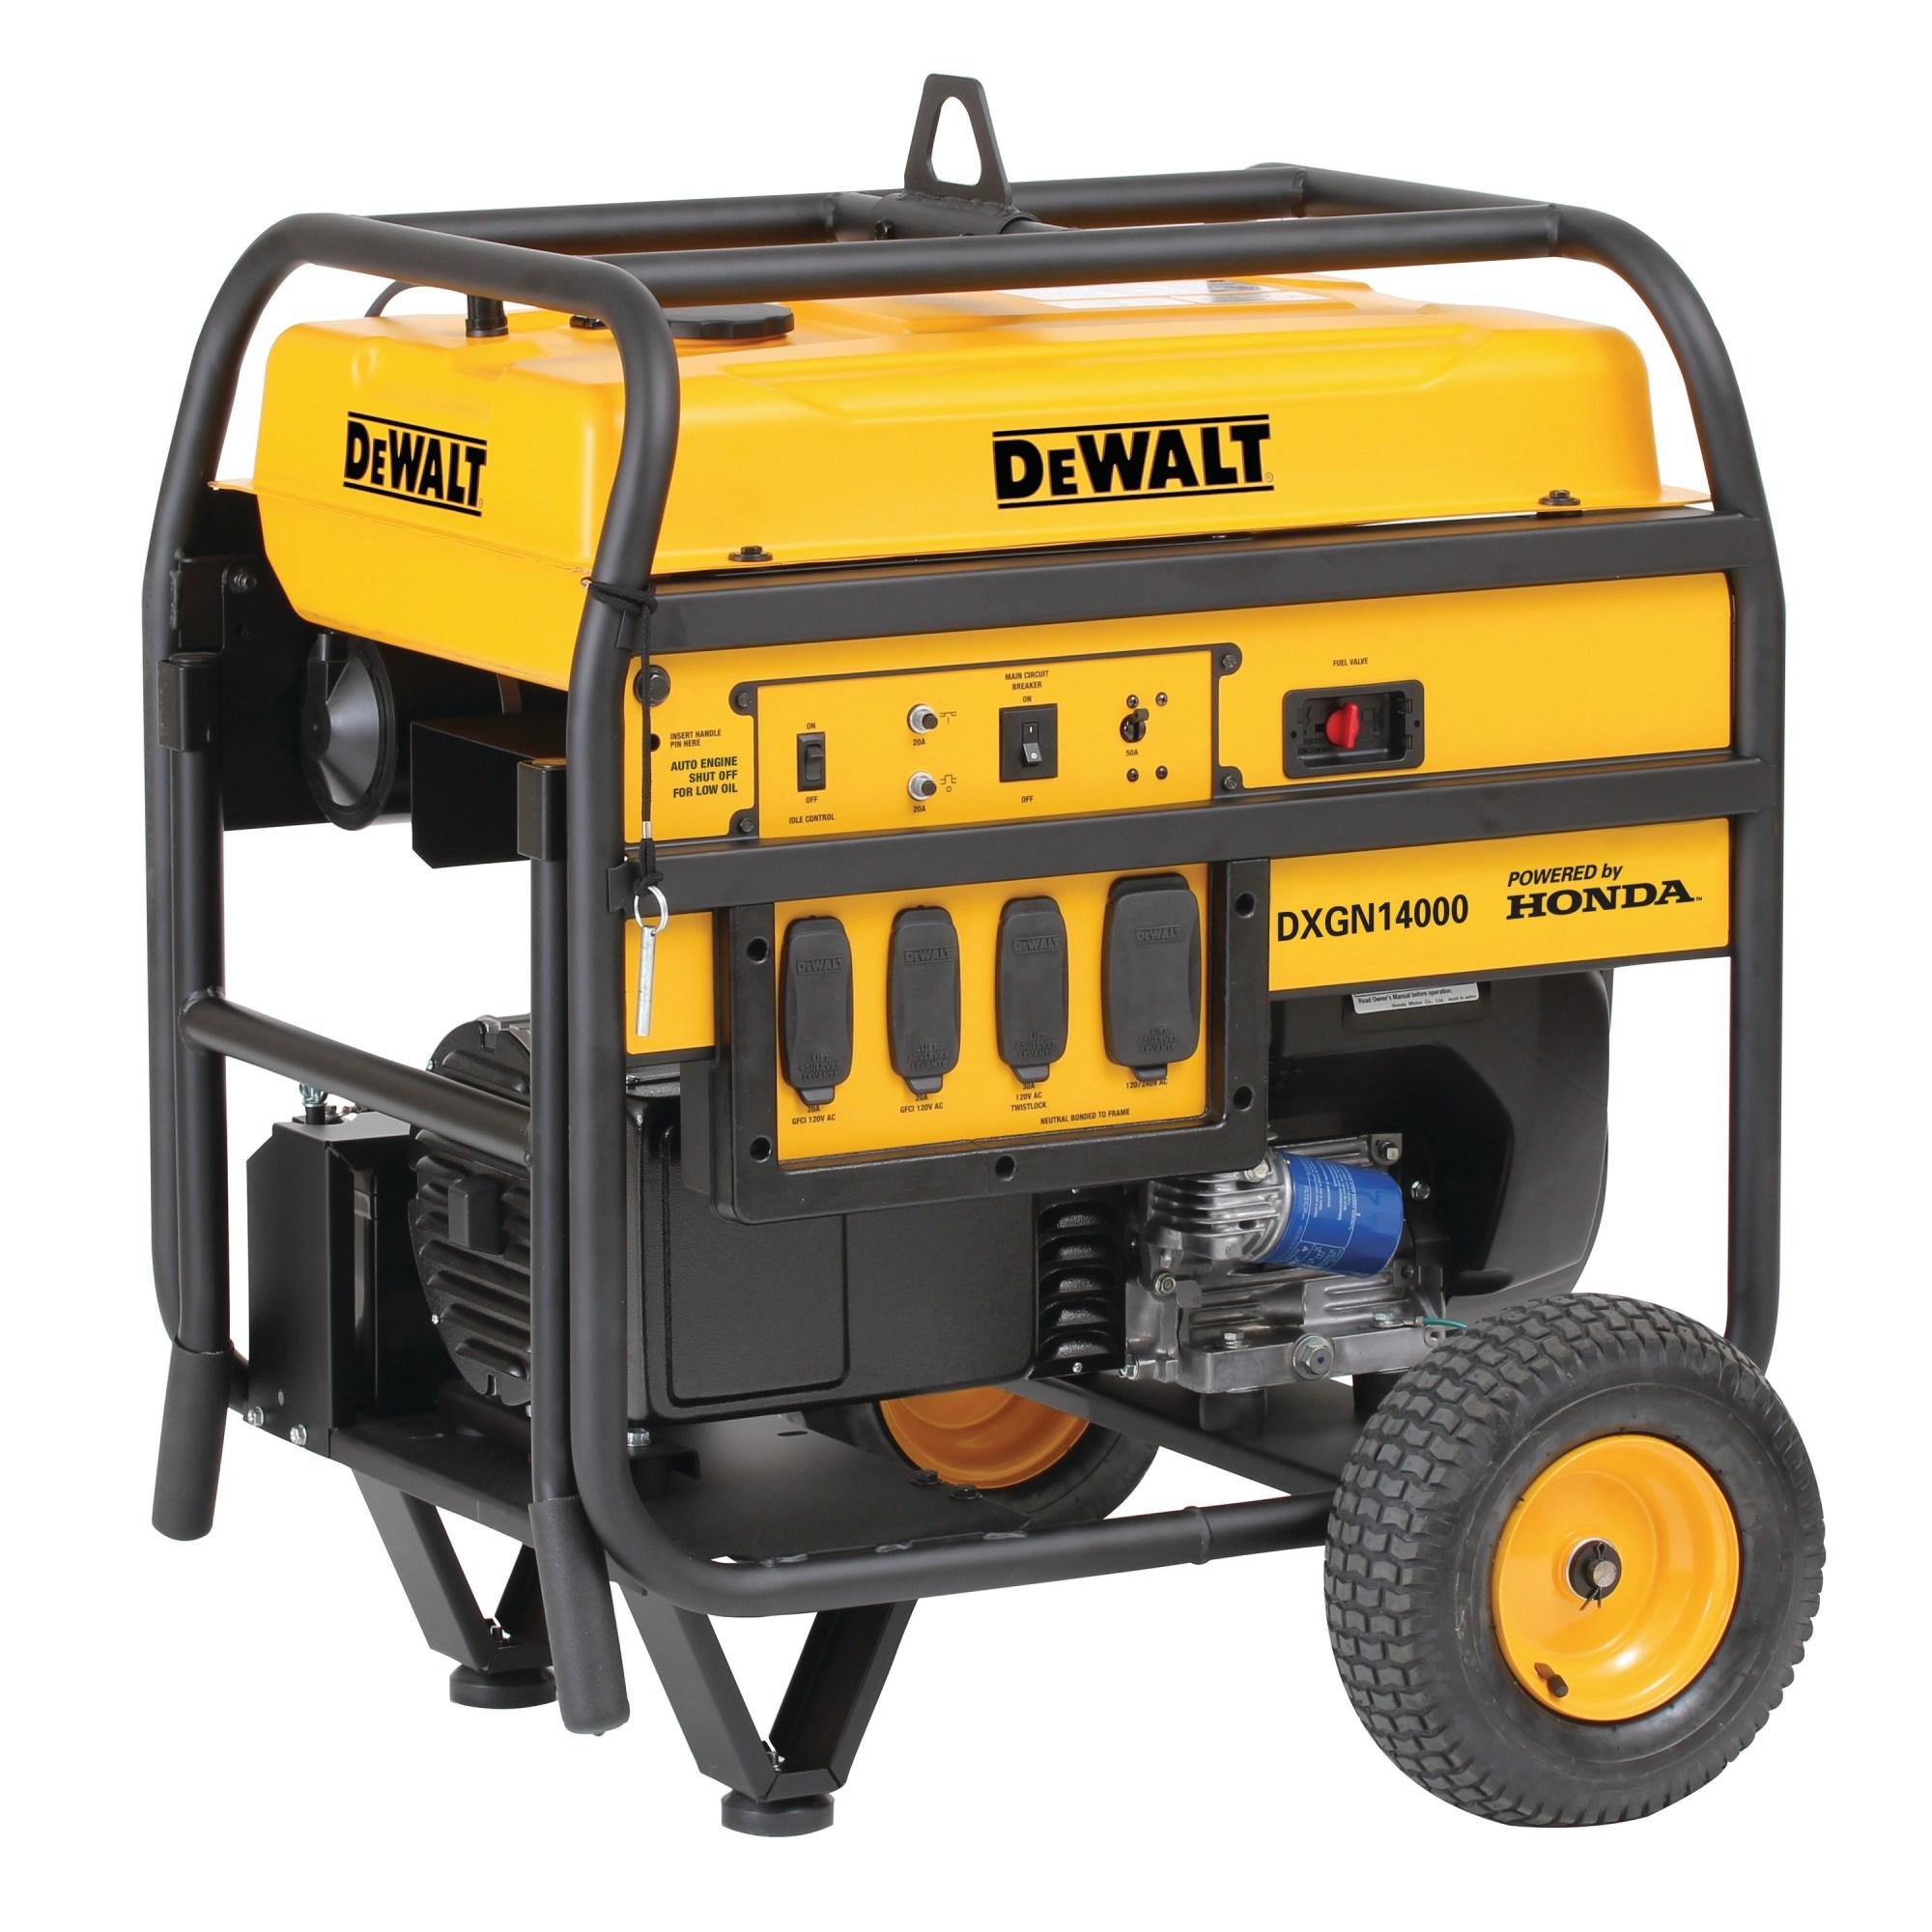 hight resolution of 14000 watt commercial generator dxgn14000 dewalt dewalt generator wiring diagram